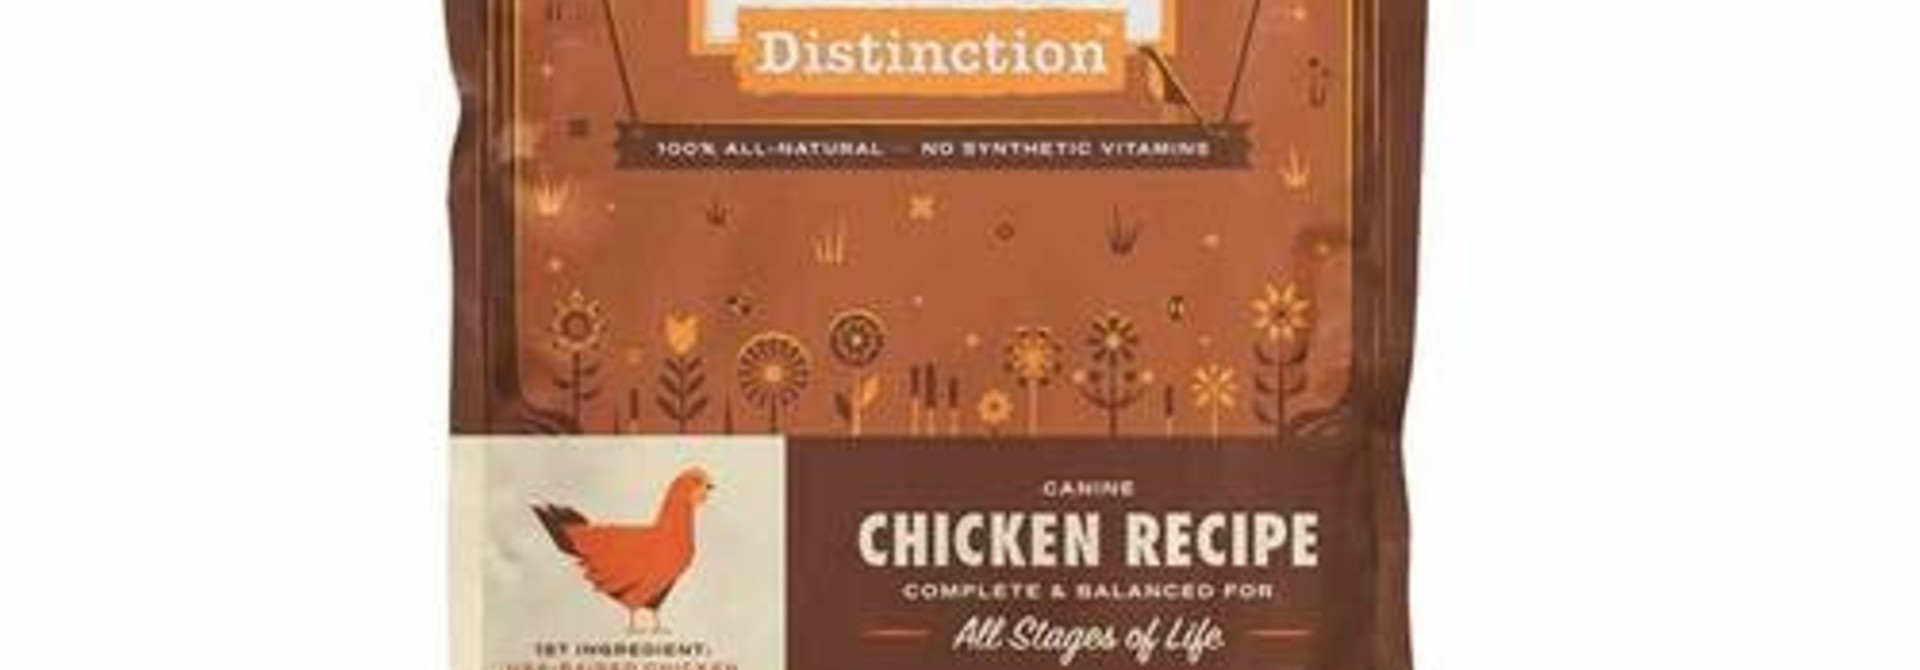 Distinction Dog Food - Chicken - 24lb